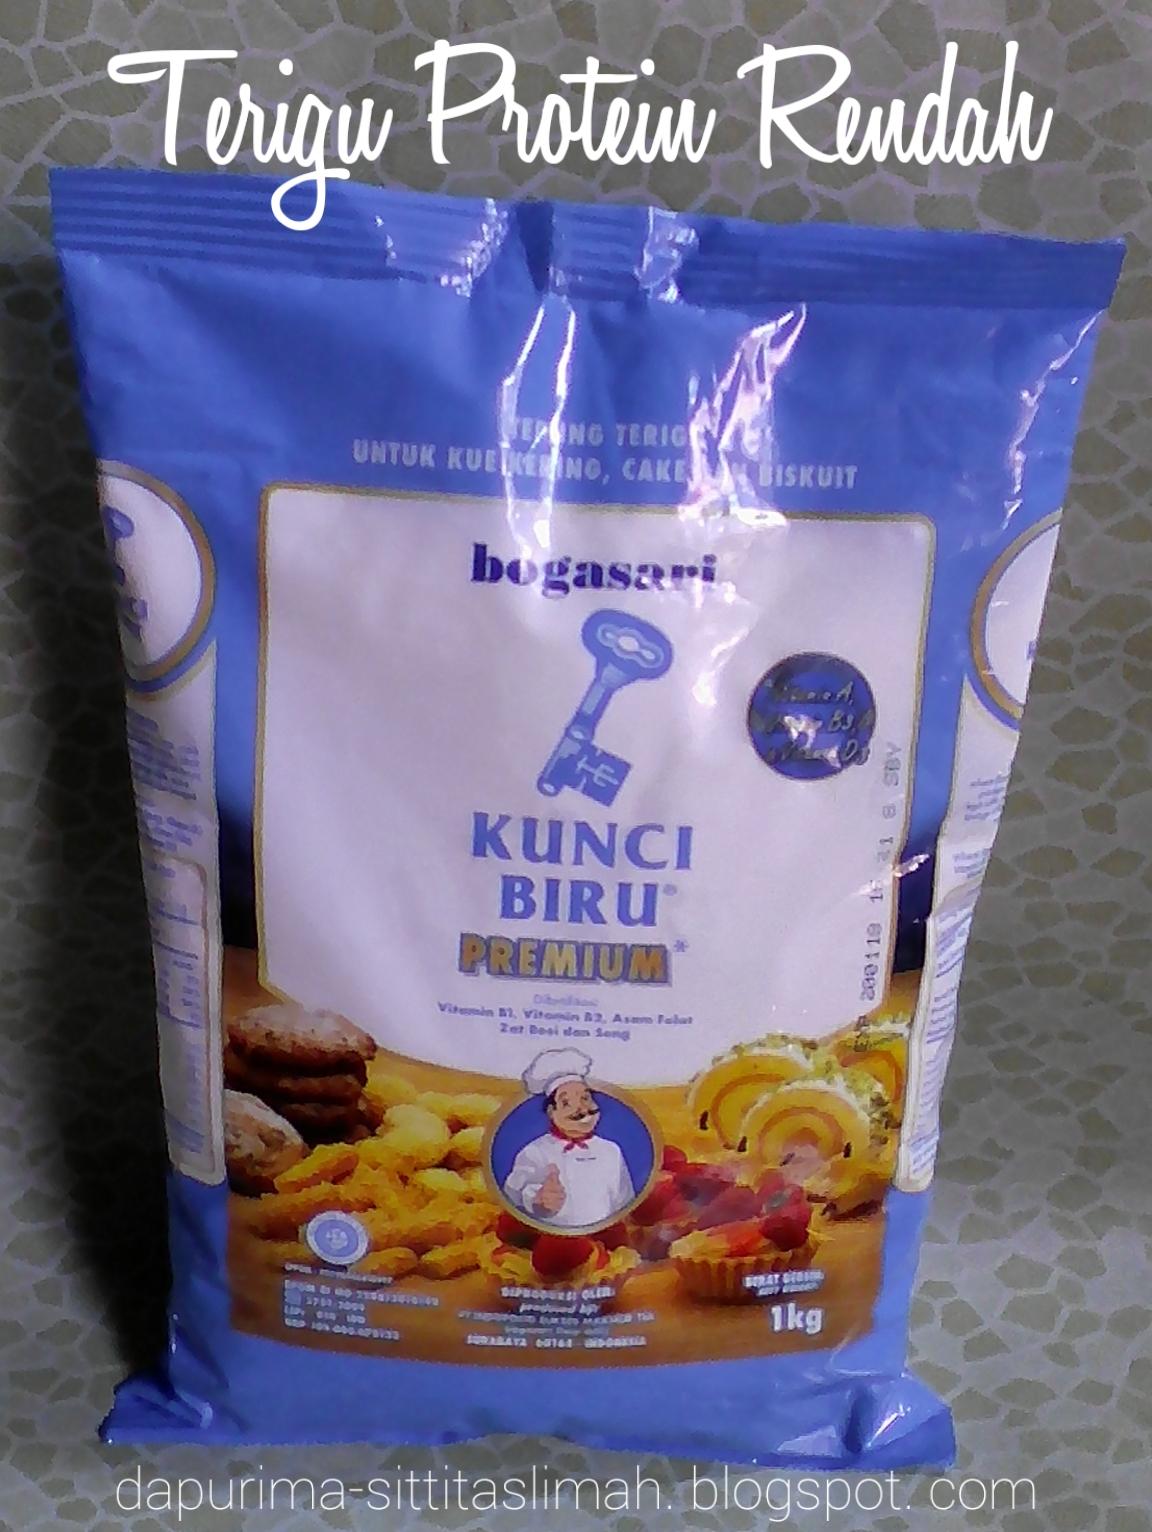 Tepung Terigu Protein Rendah : tepung, terigu, protein, rendah, Tepung, Terigu